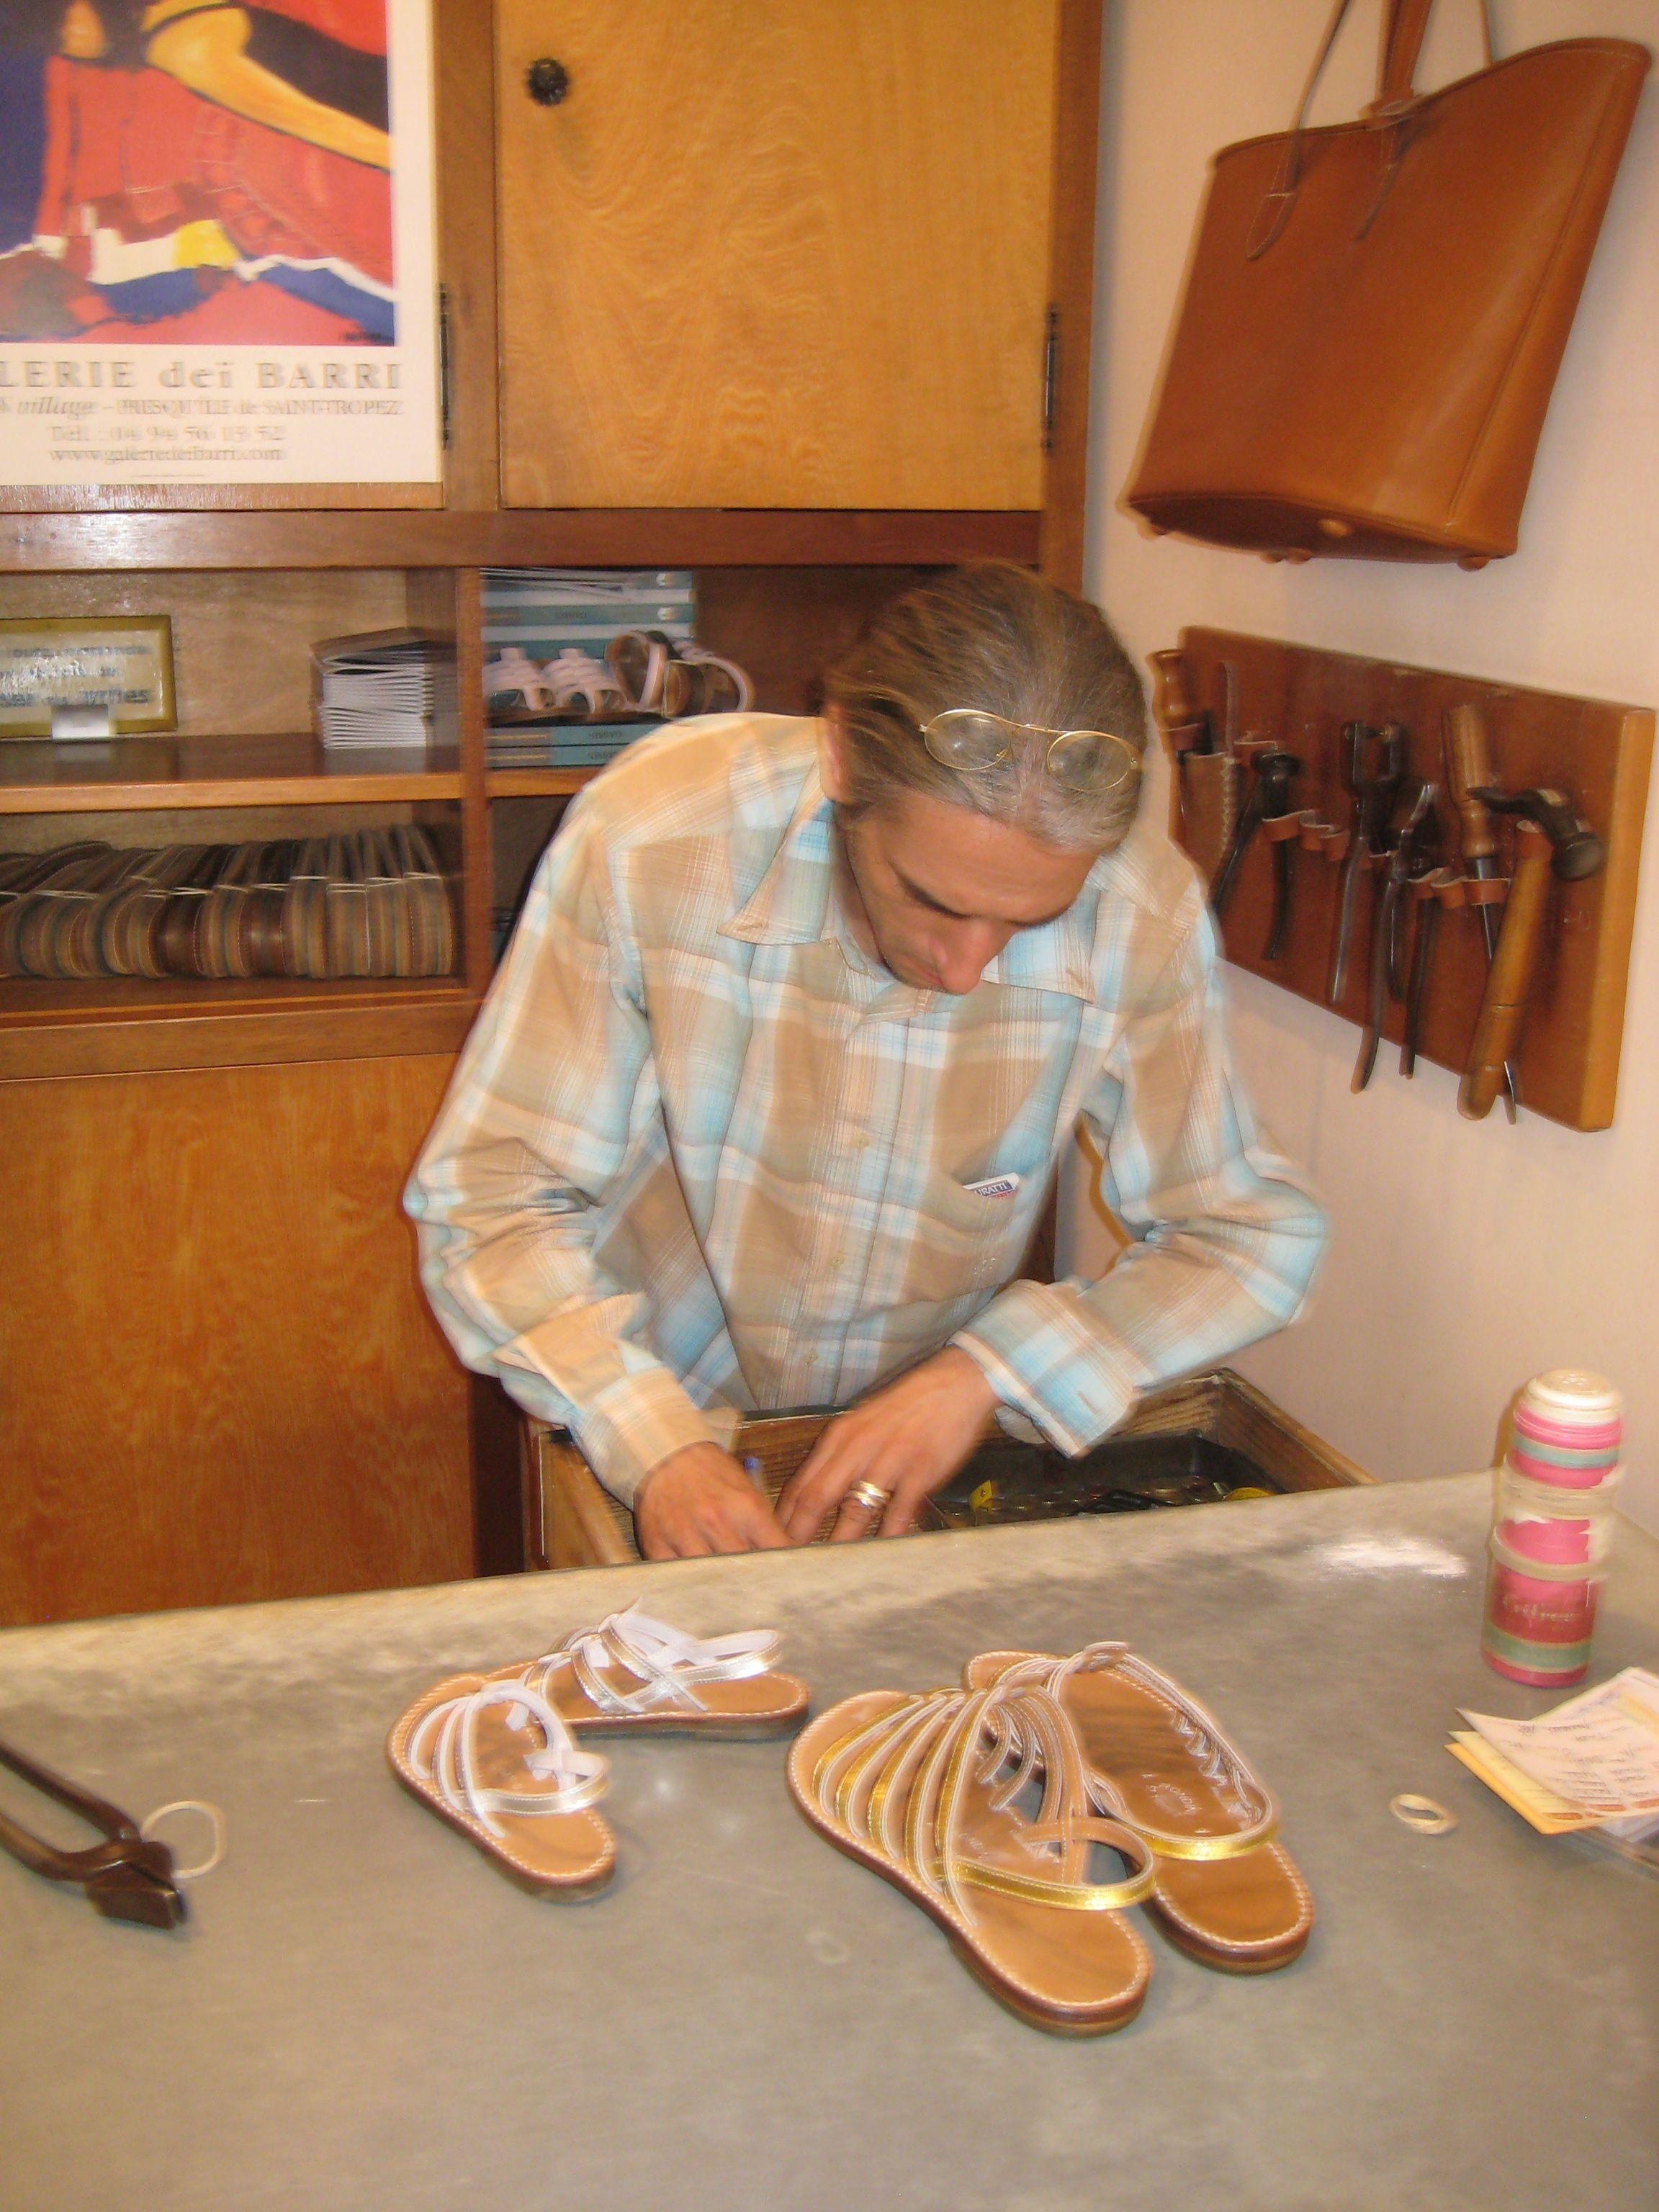 74a87ed10da Original Tropezienne sandals - handmade by Rondini in St. Tropez (got my  daughter s to match mine)